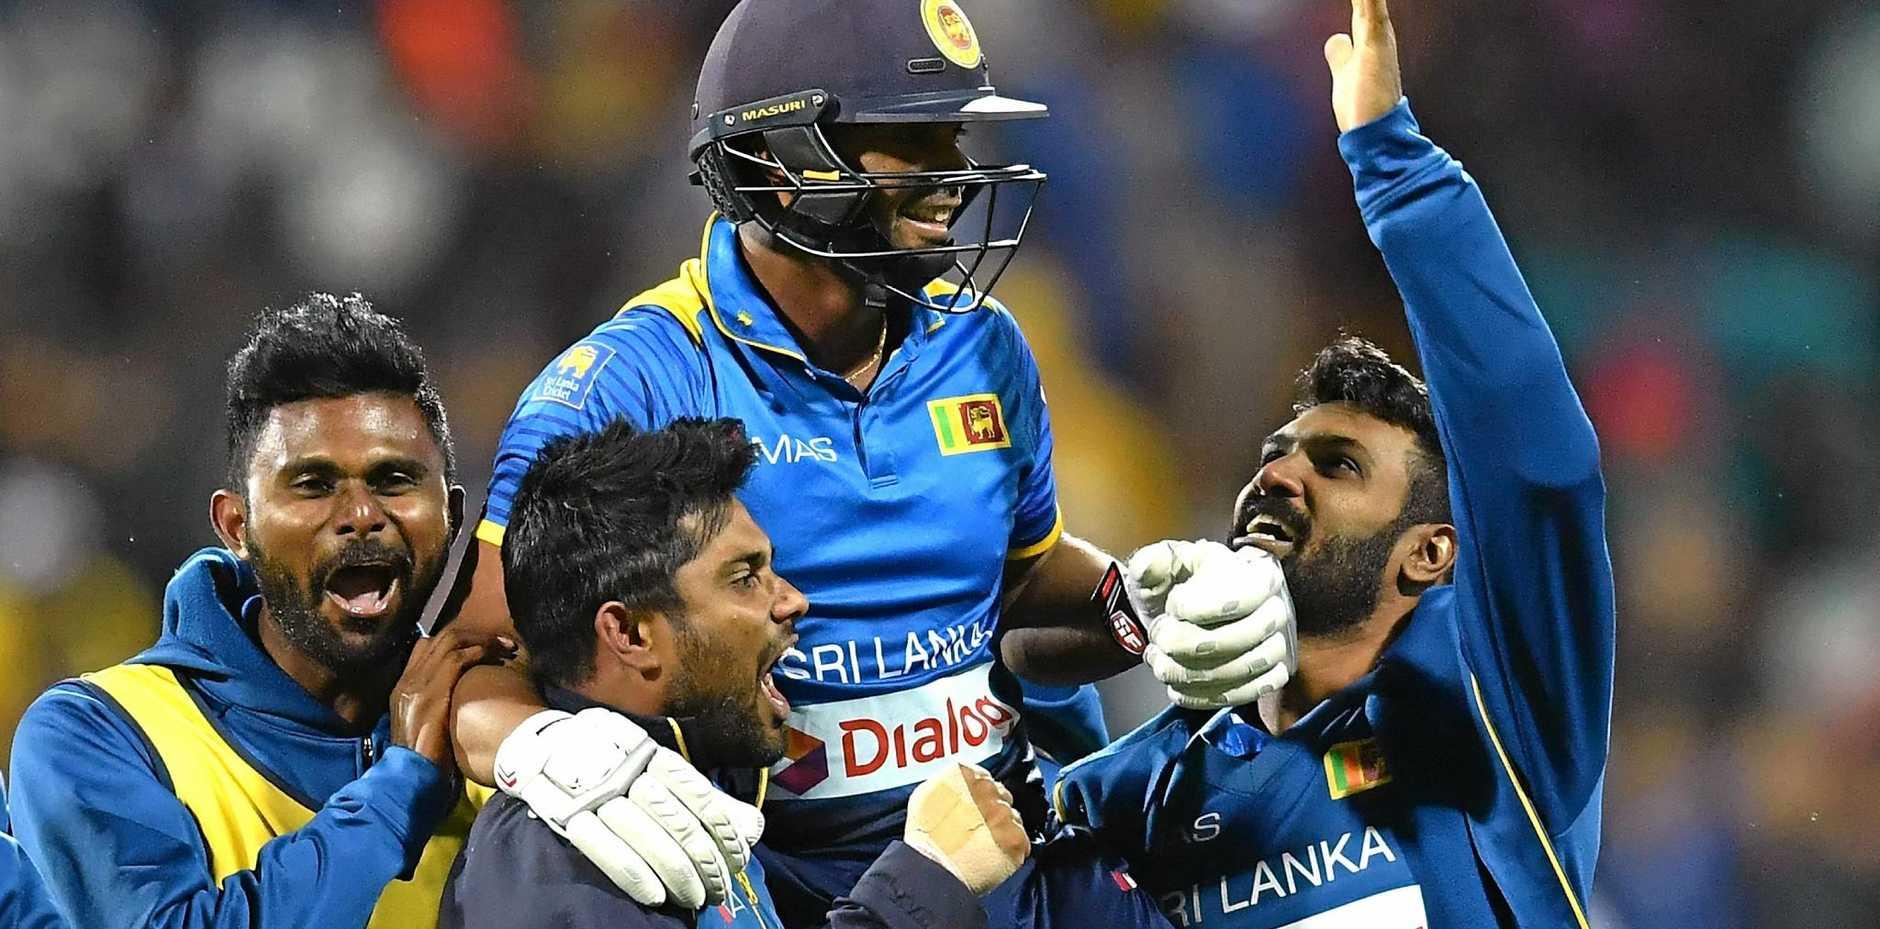 Asela Gunaratne of Sri Lanka is congratulated by teammates after hitting the winning runs to win the second International Twenty20 match between Australia and Sri Lanka at Simonds Stadium.